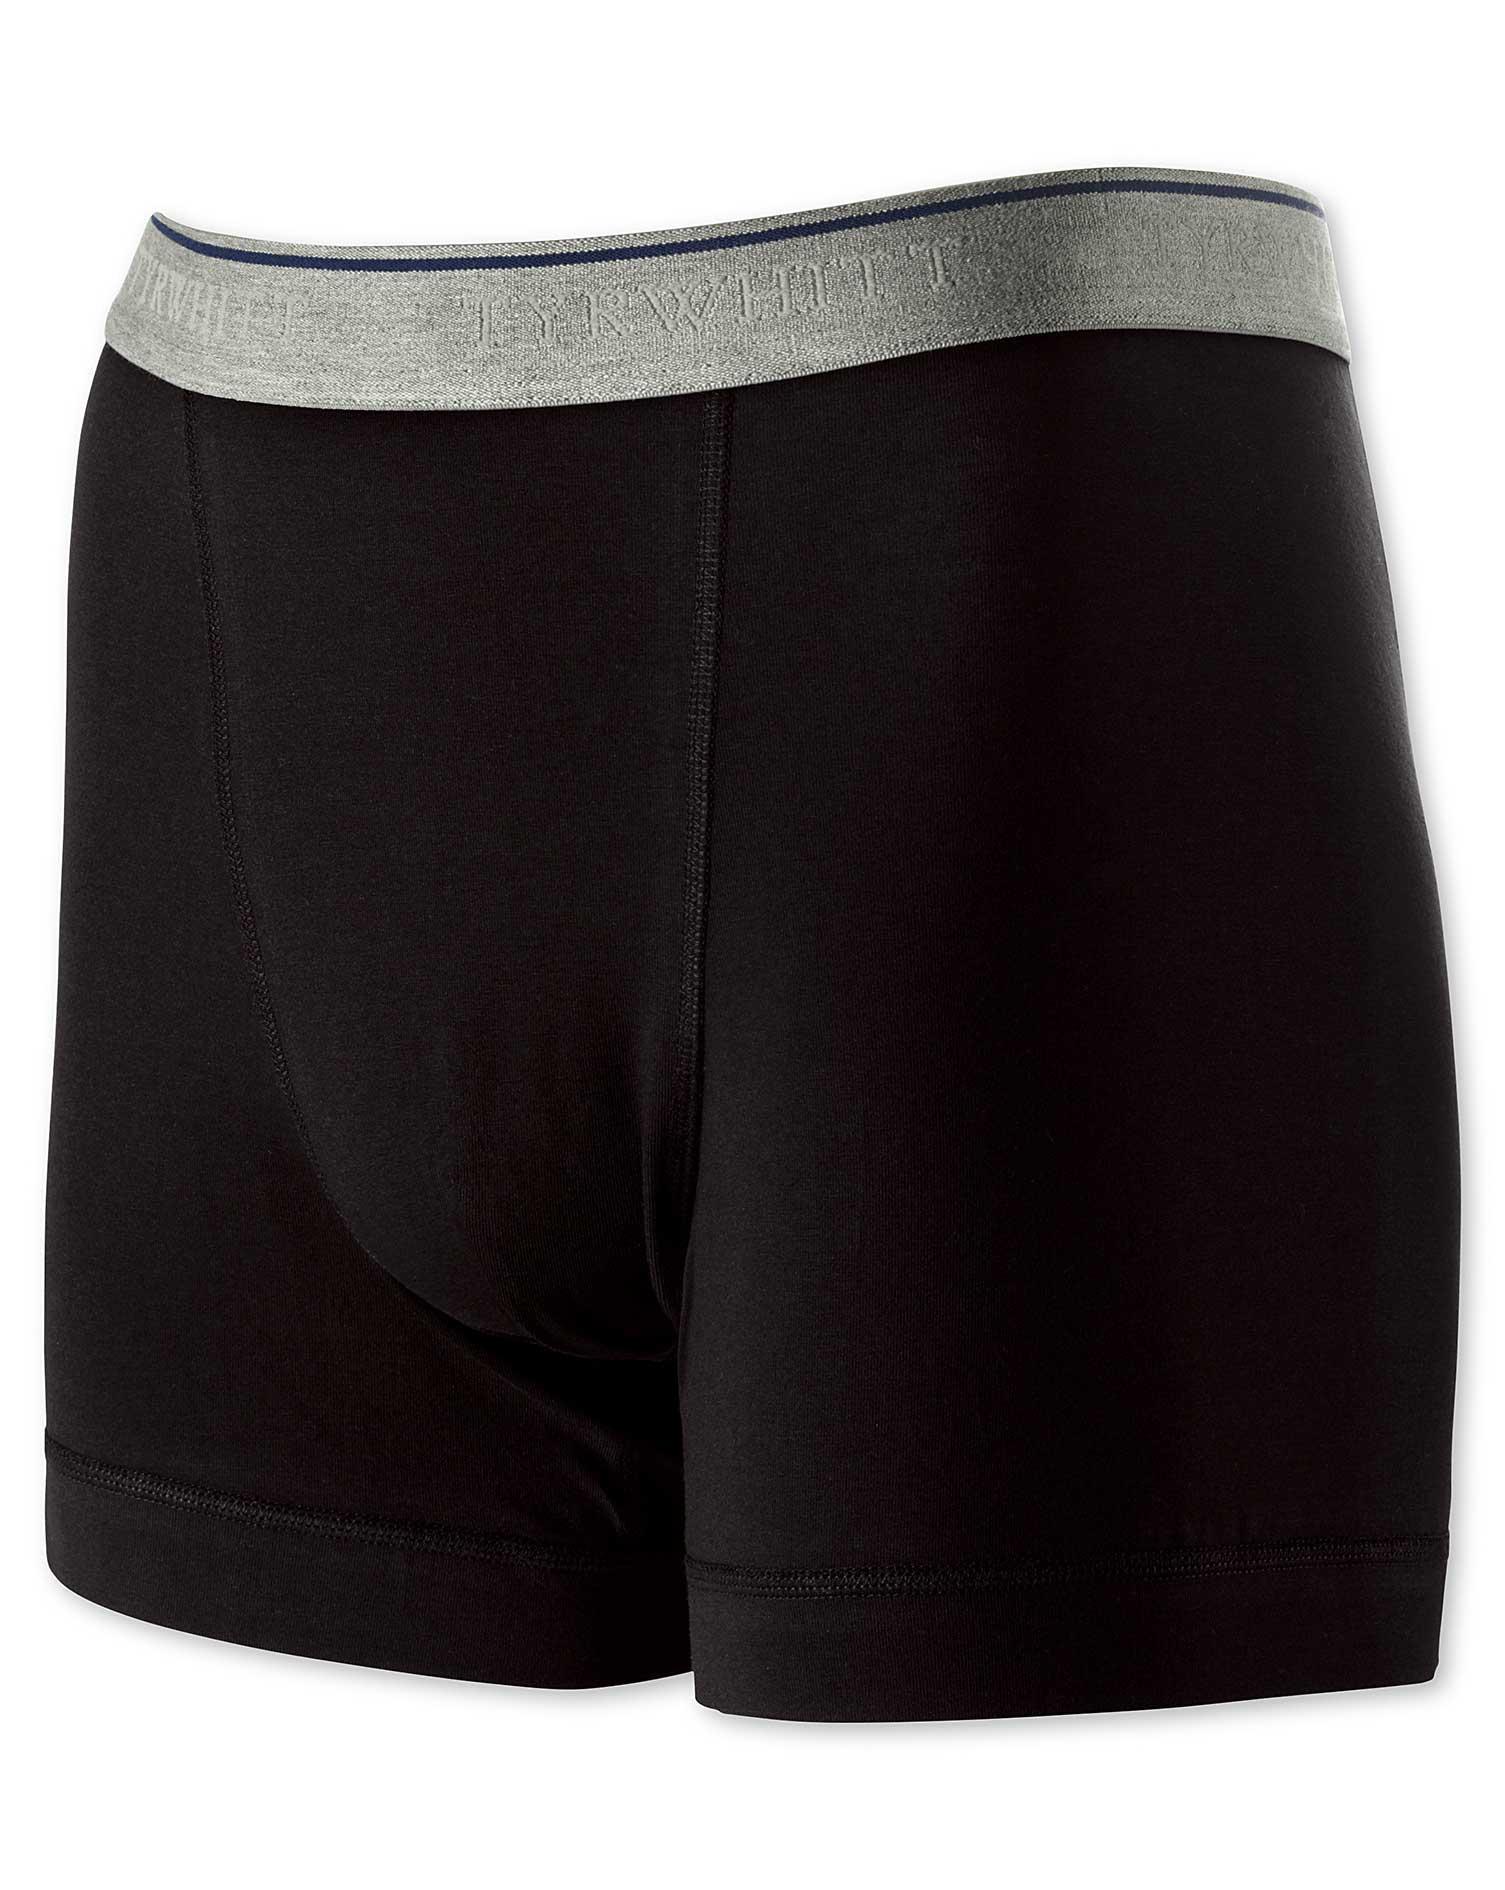 Black Cotton Stretch Jersey Trunks Size XL by Charles Tyrwhitt